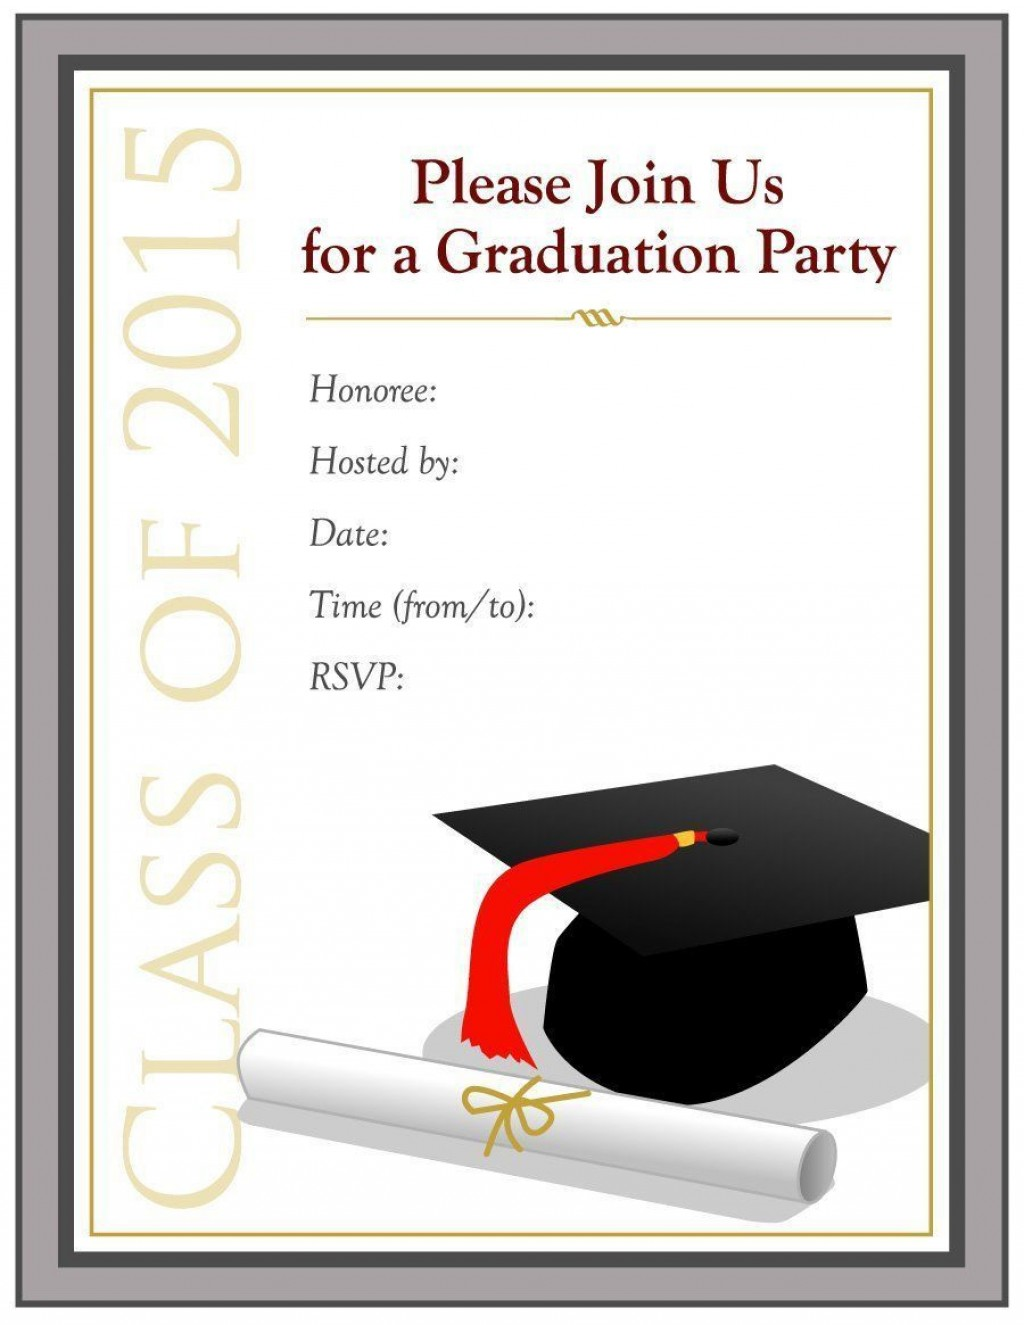 000 Awful Microsoft Word Graduation Invitation Template Image  PartyLarge